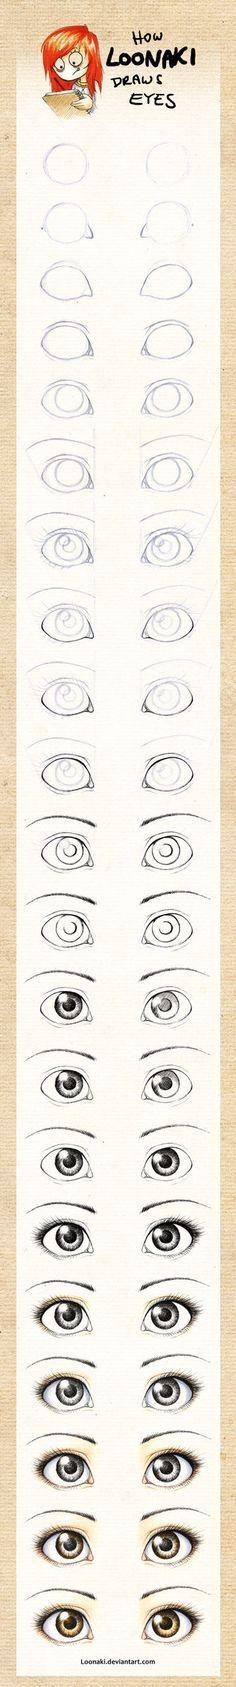 How Loonaki Draws Eyes by *Loonaki on deviantART